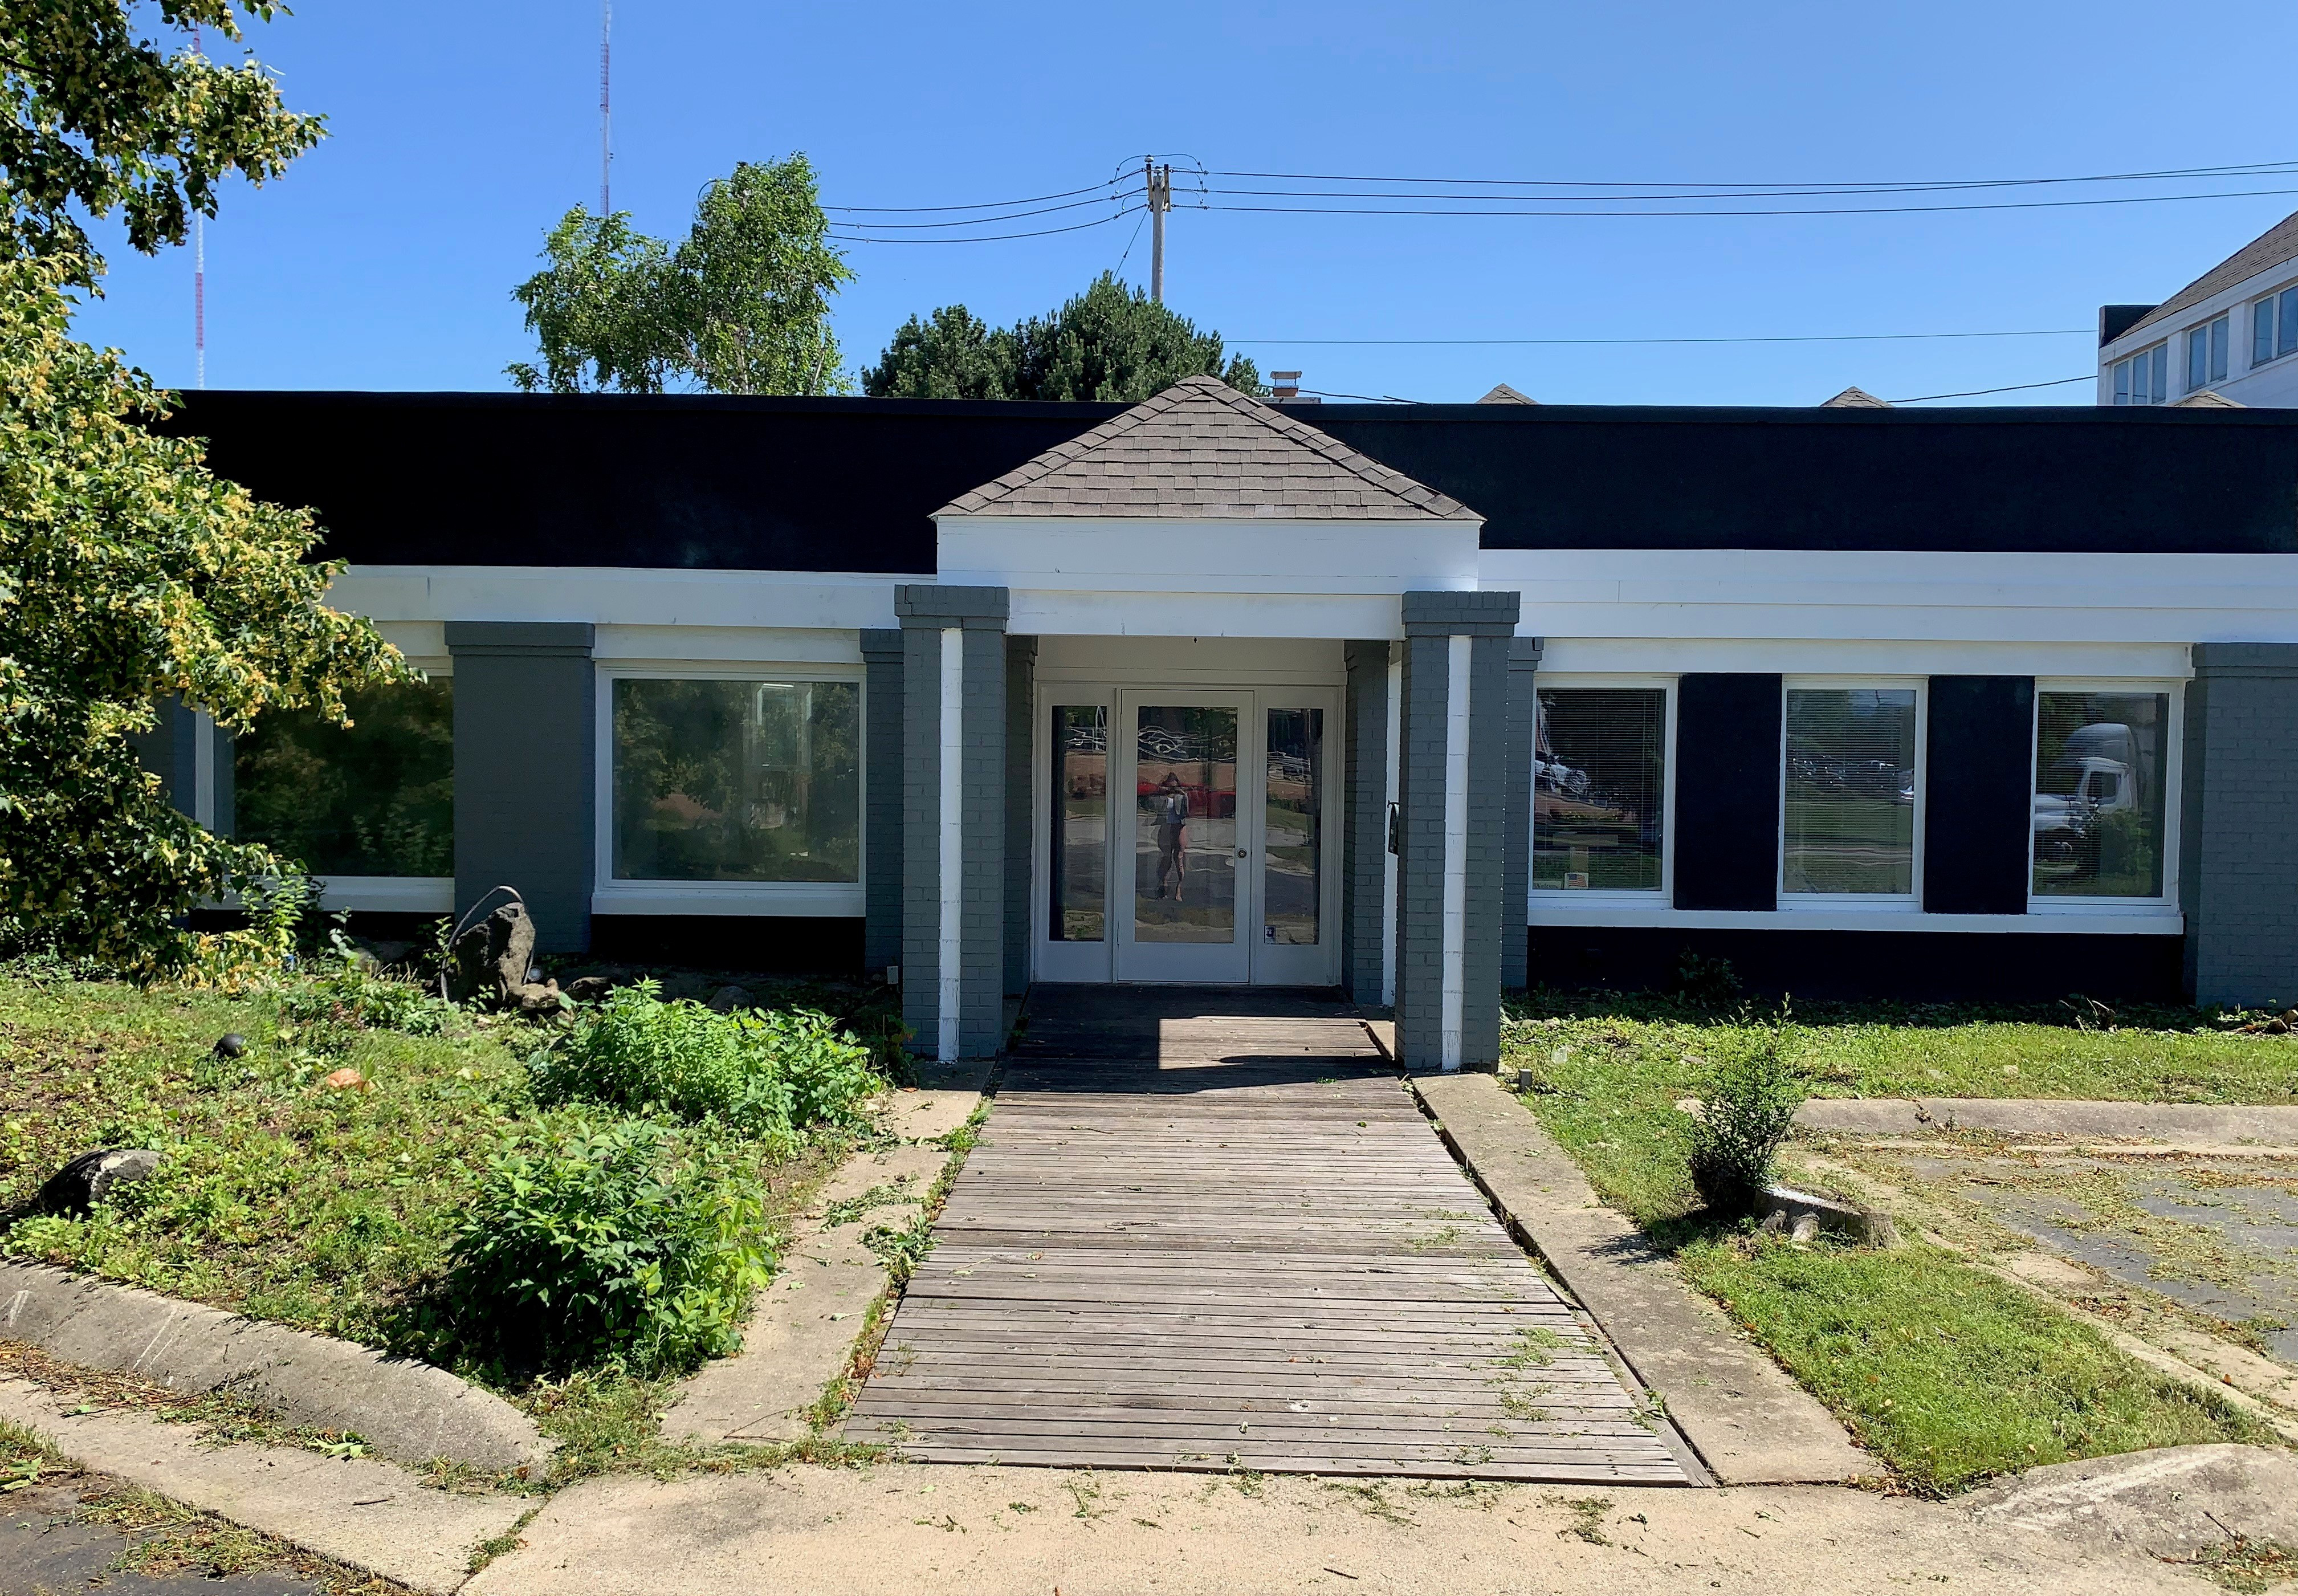 1811 W Silver Spring Drive, Glendale WI